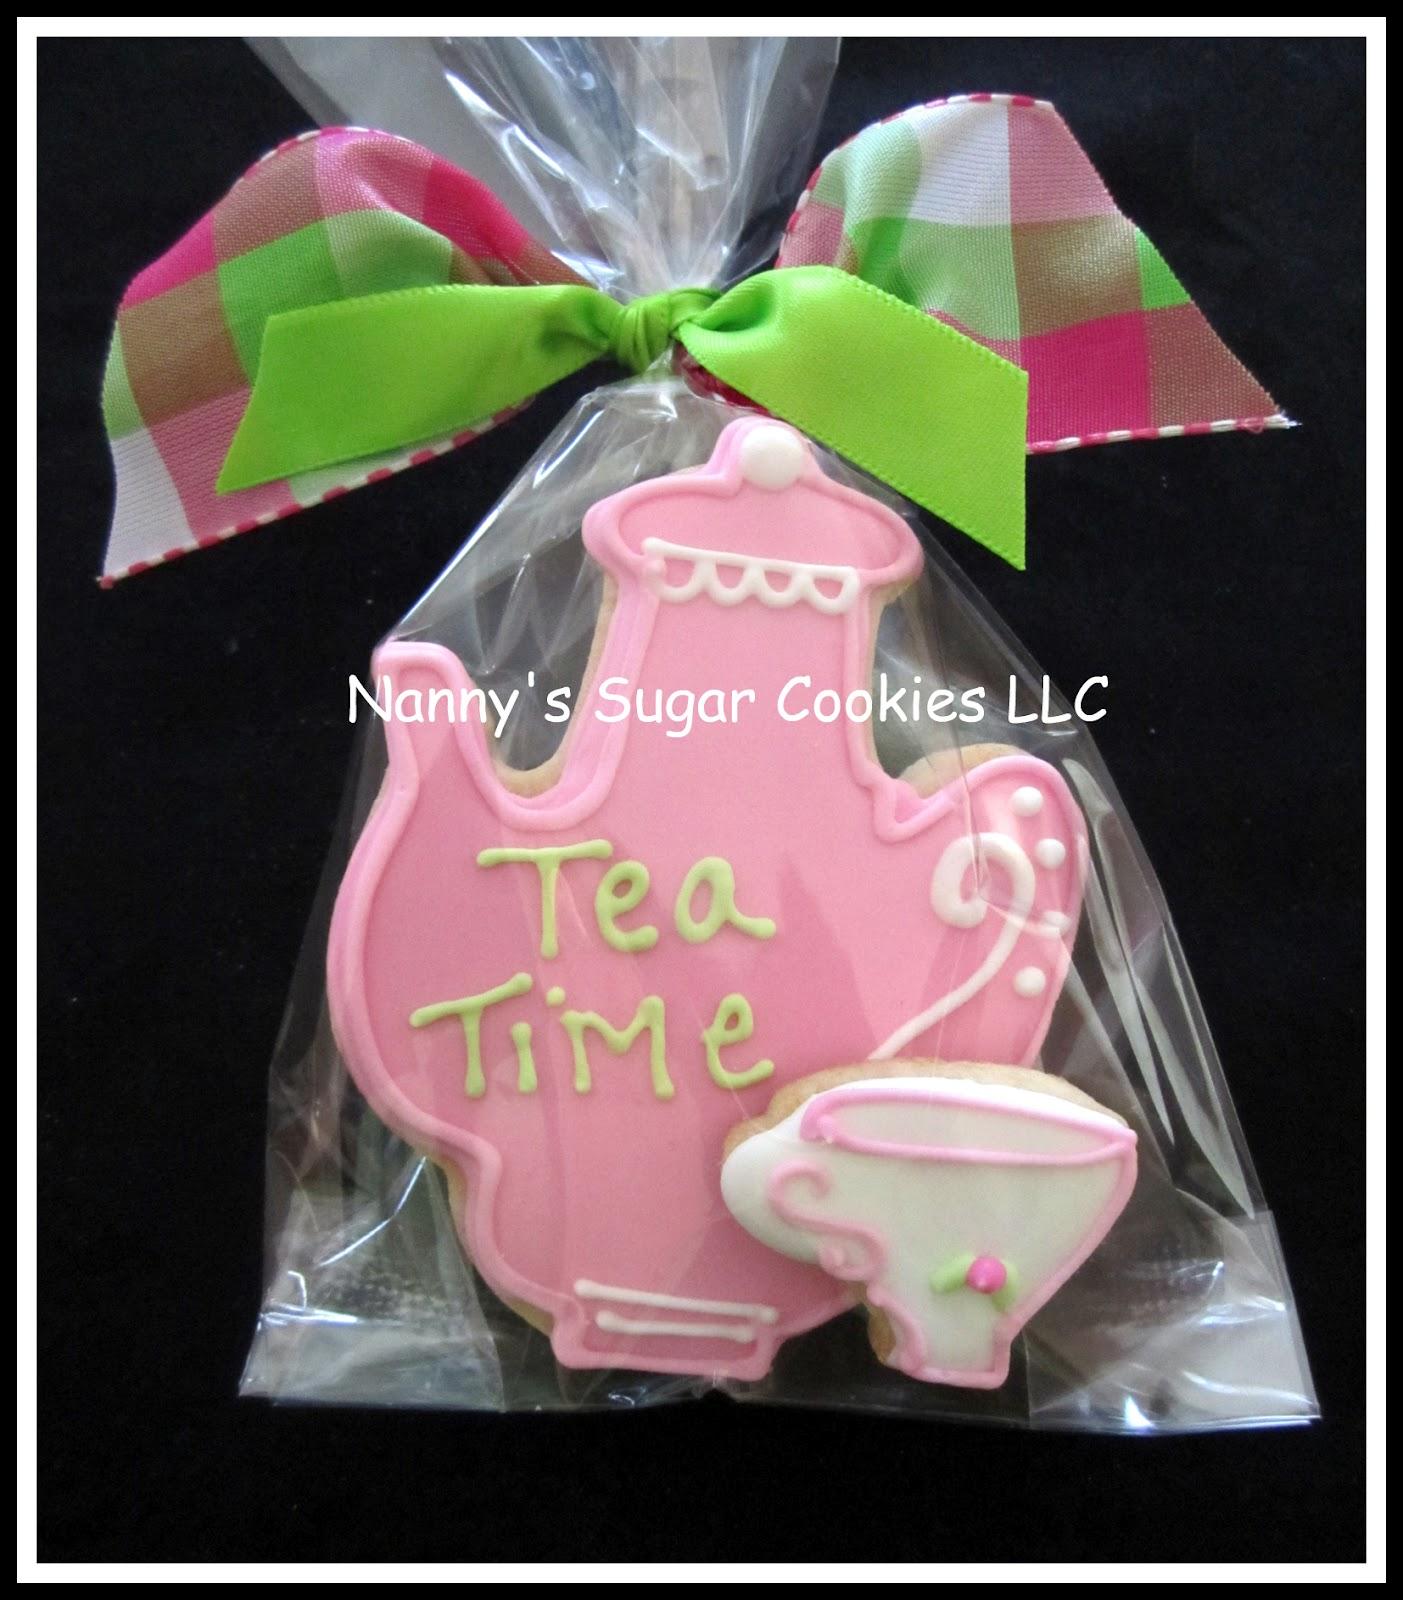 Nanny\'s Sugar Cookies LLC: February 2012